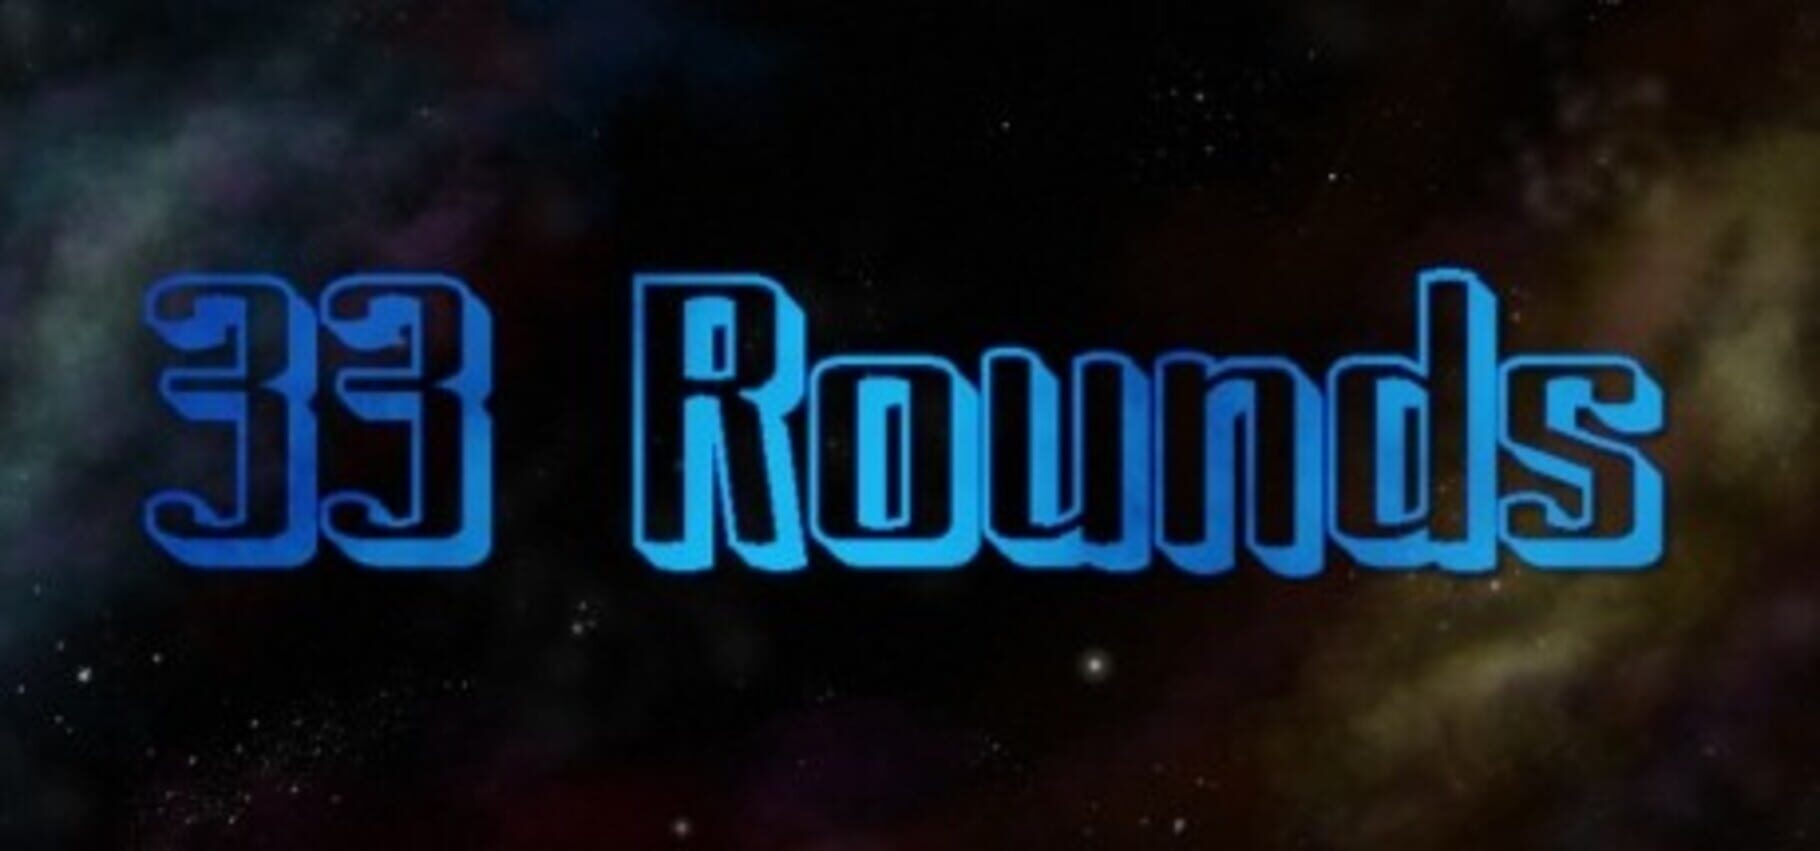 buy 33 Rounds cd key for all platform